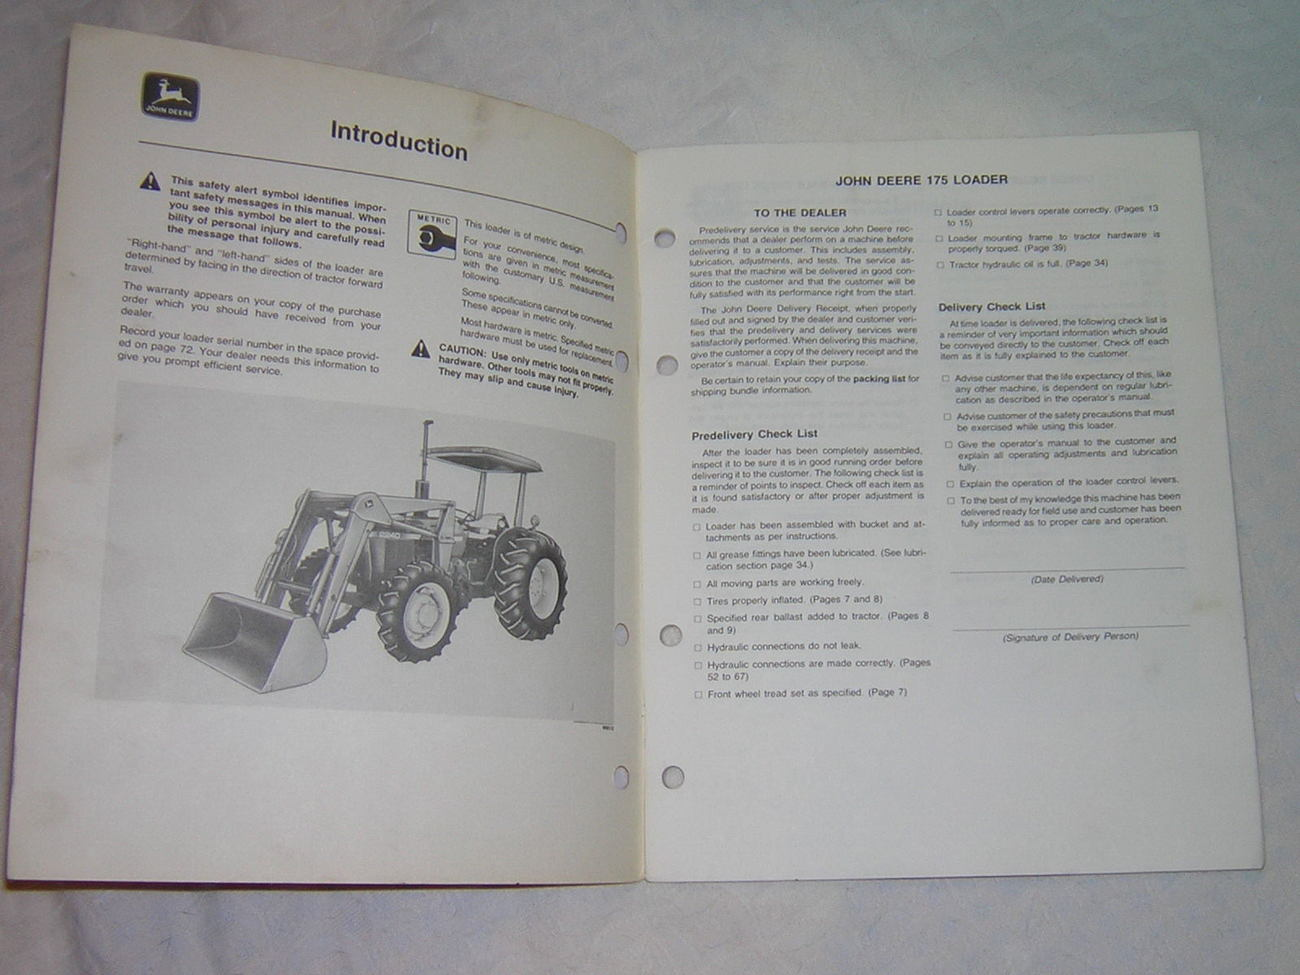 John Deere 175 Farm Loader Operator's Manual, Dealer Service Shop Copy